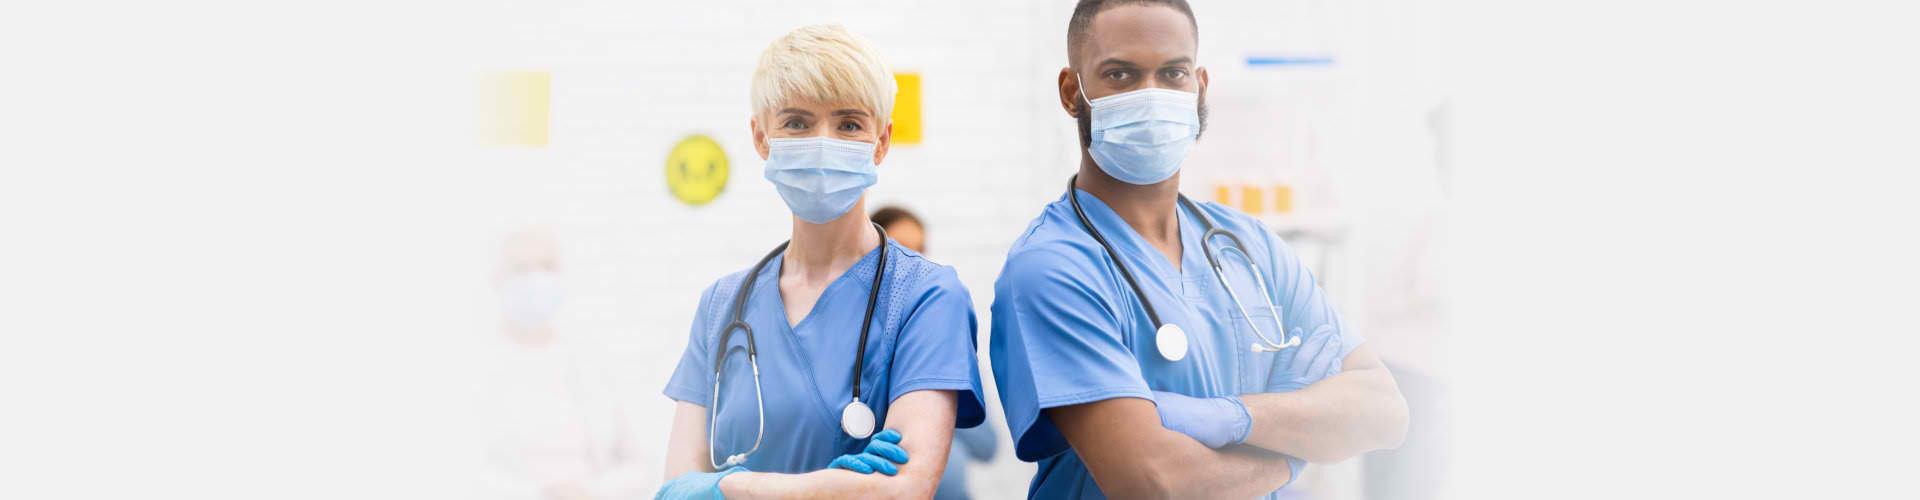 two medical staffs